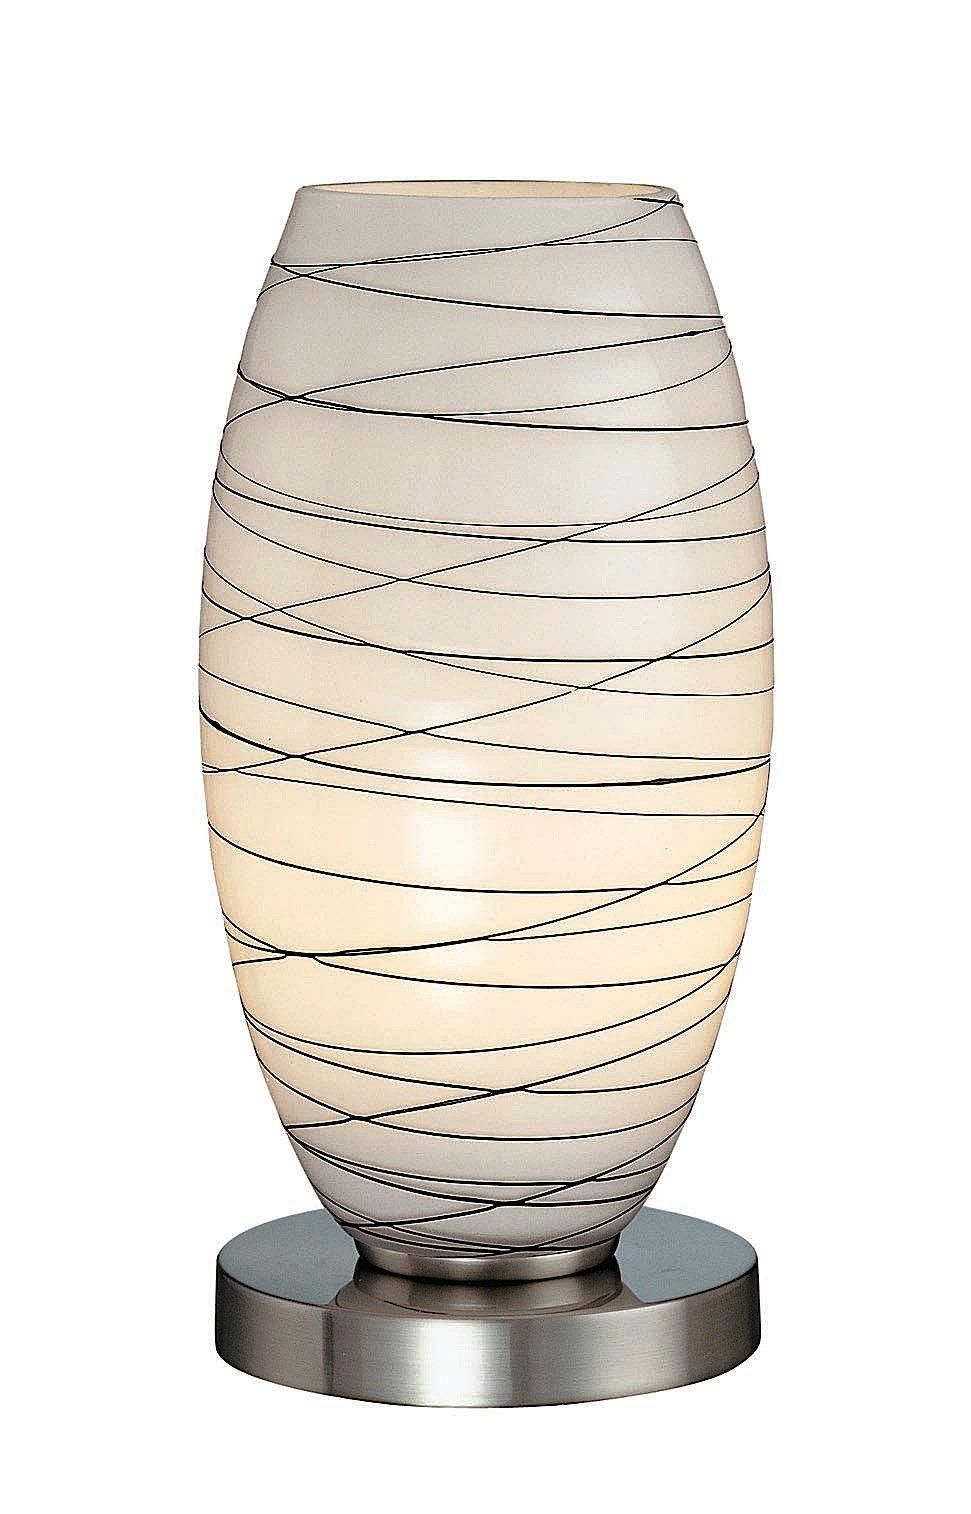 Lite Source LS-20855 Giacomo Table Lamp, Polished Steel with Glass Shade, 10'' x 9'' x 9'', Metallic